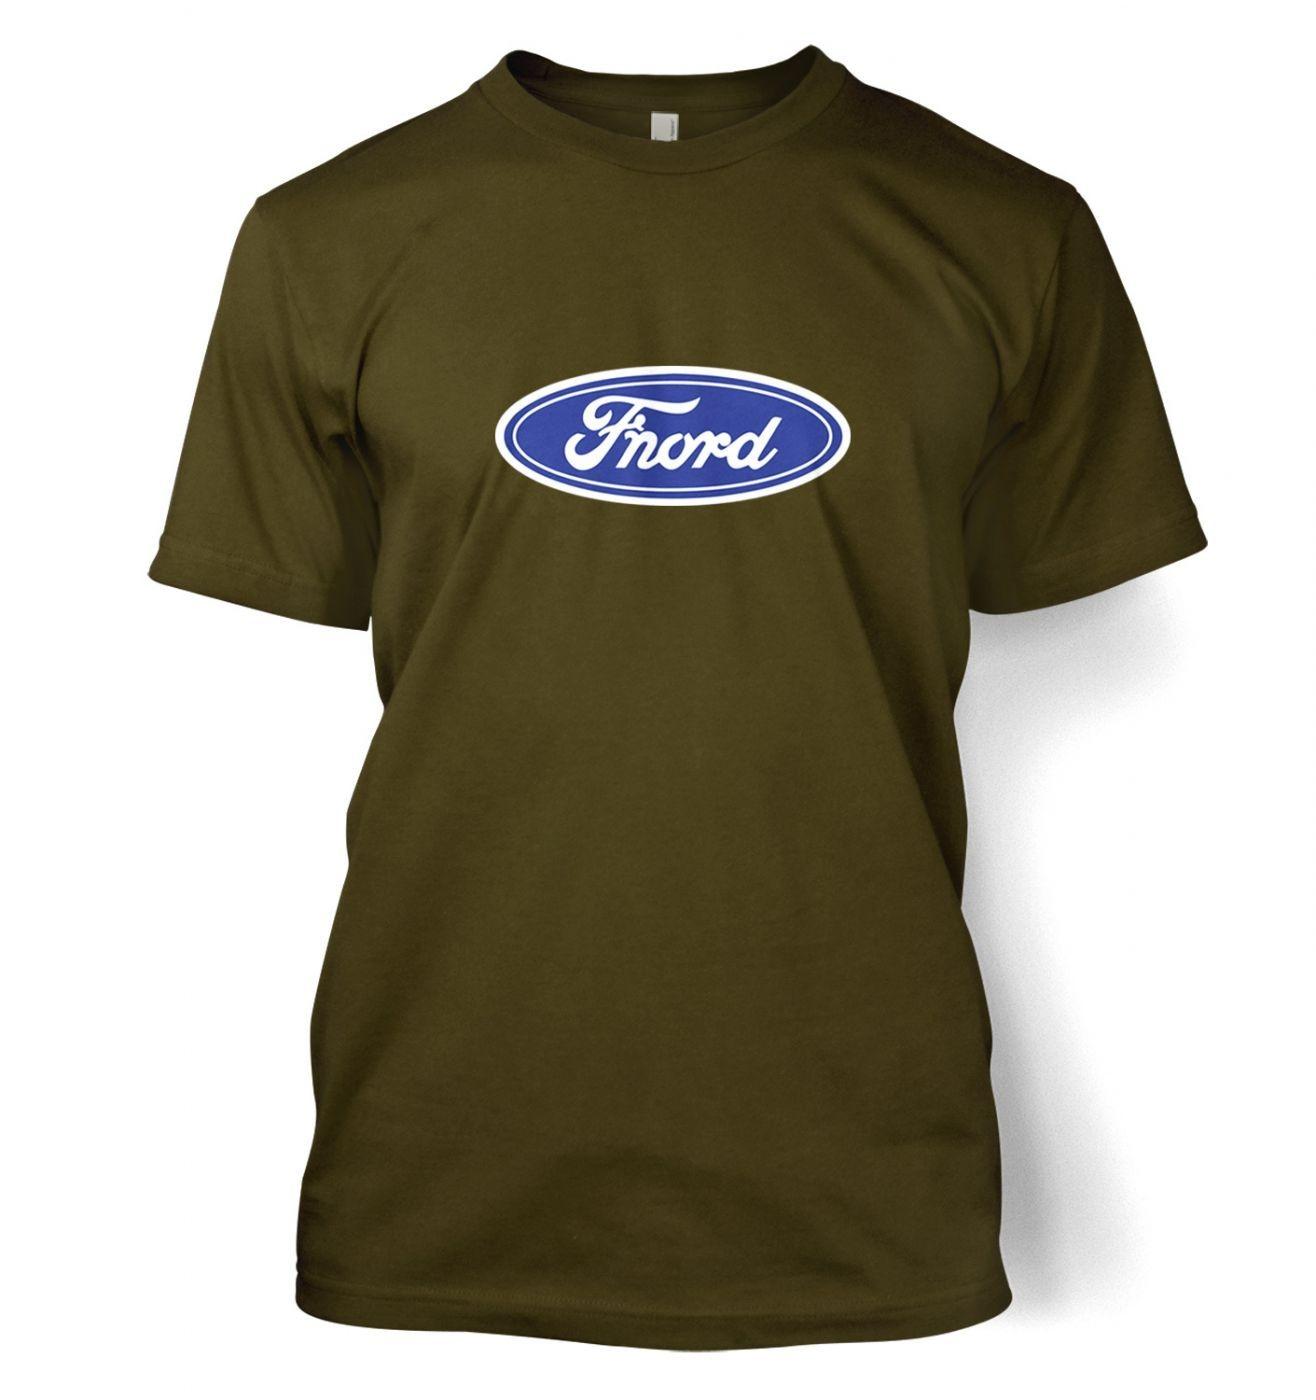 Fnord (logo) men's t-shirt